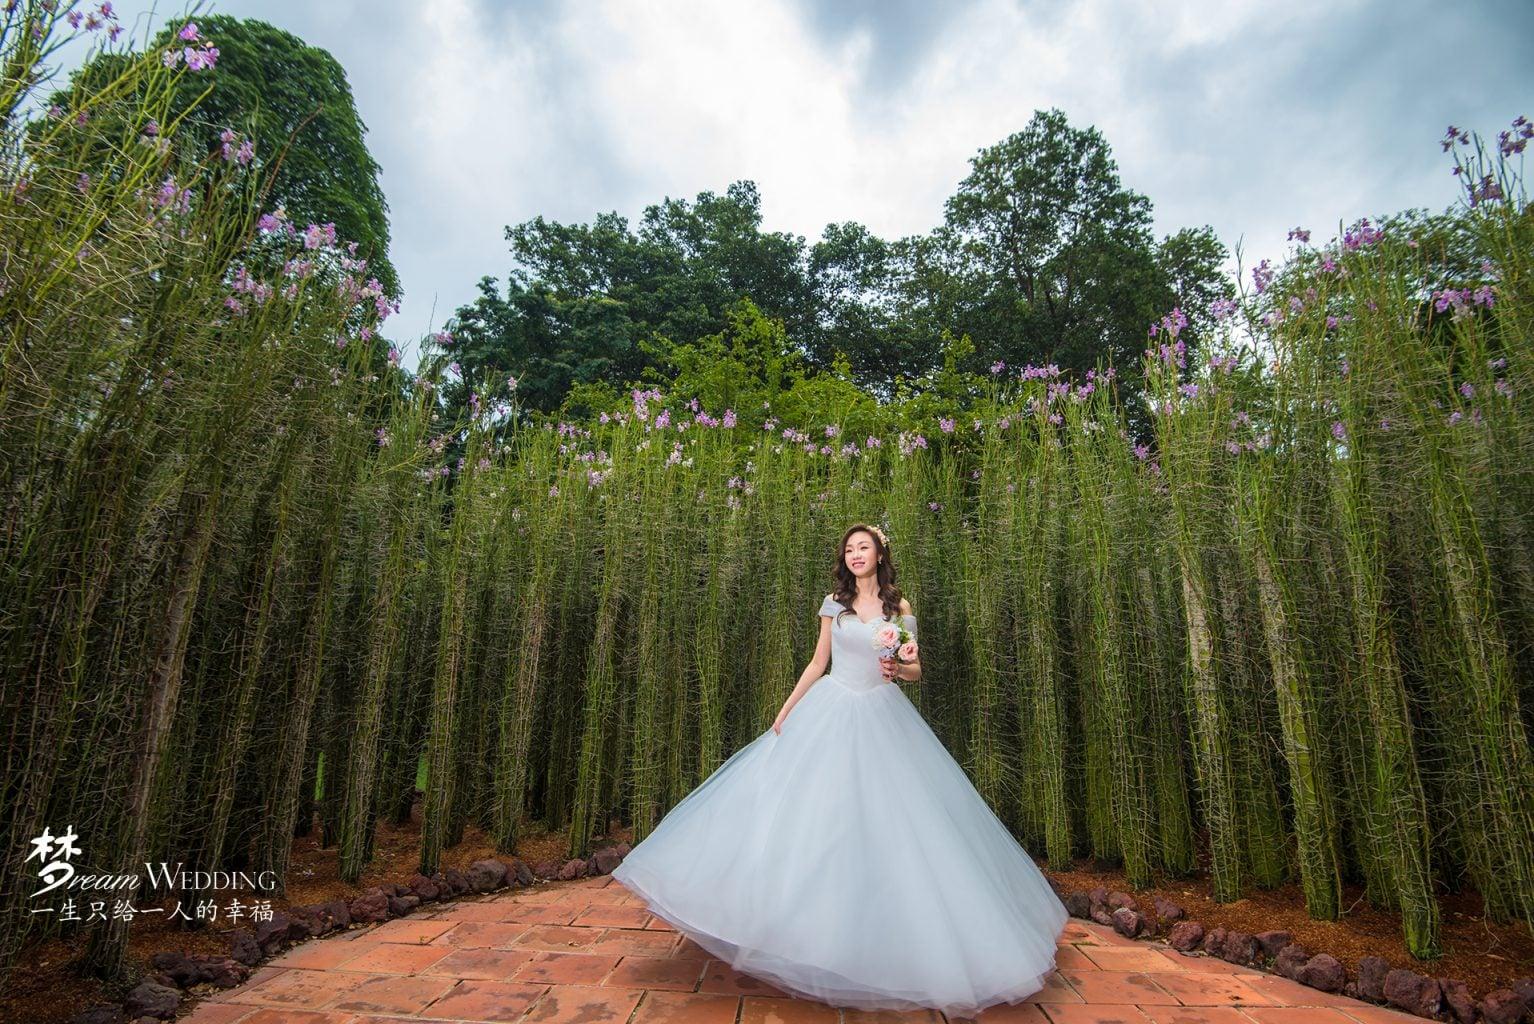 Kai Wedding Photography: James & Kai Qing (Local Pre Wedding Photography) 19/02